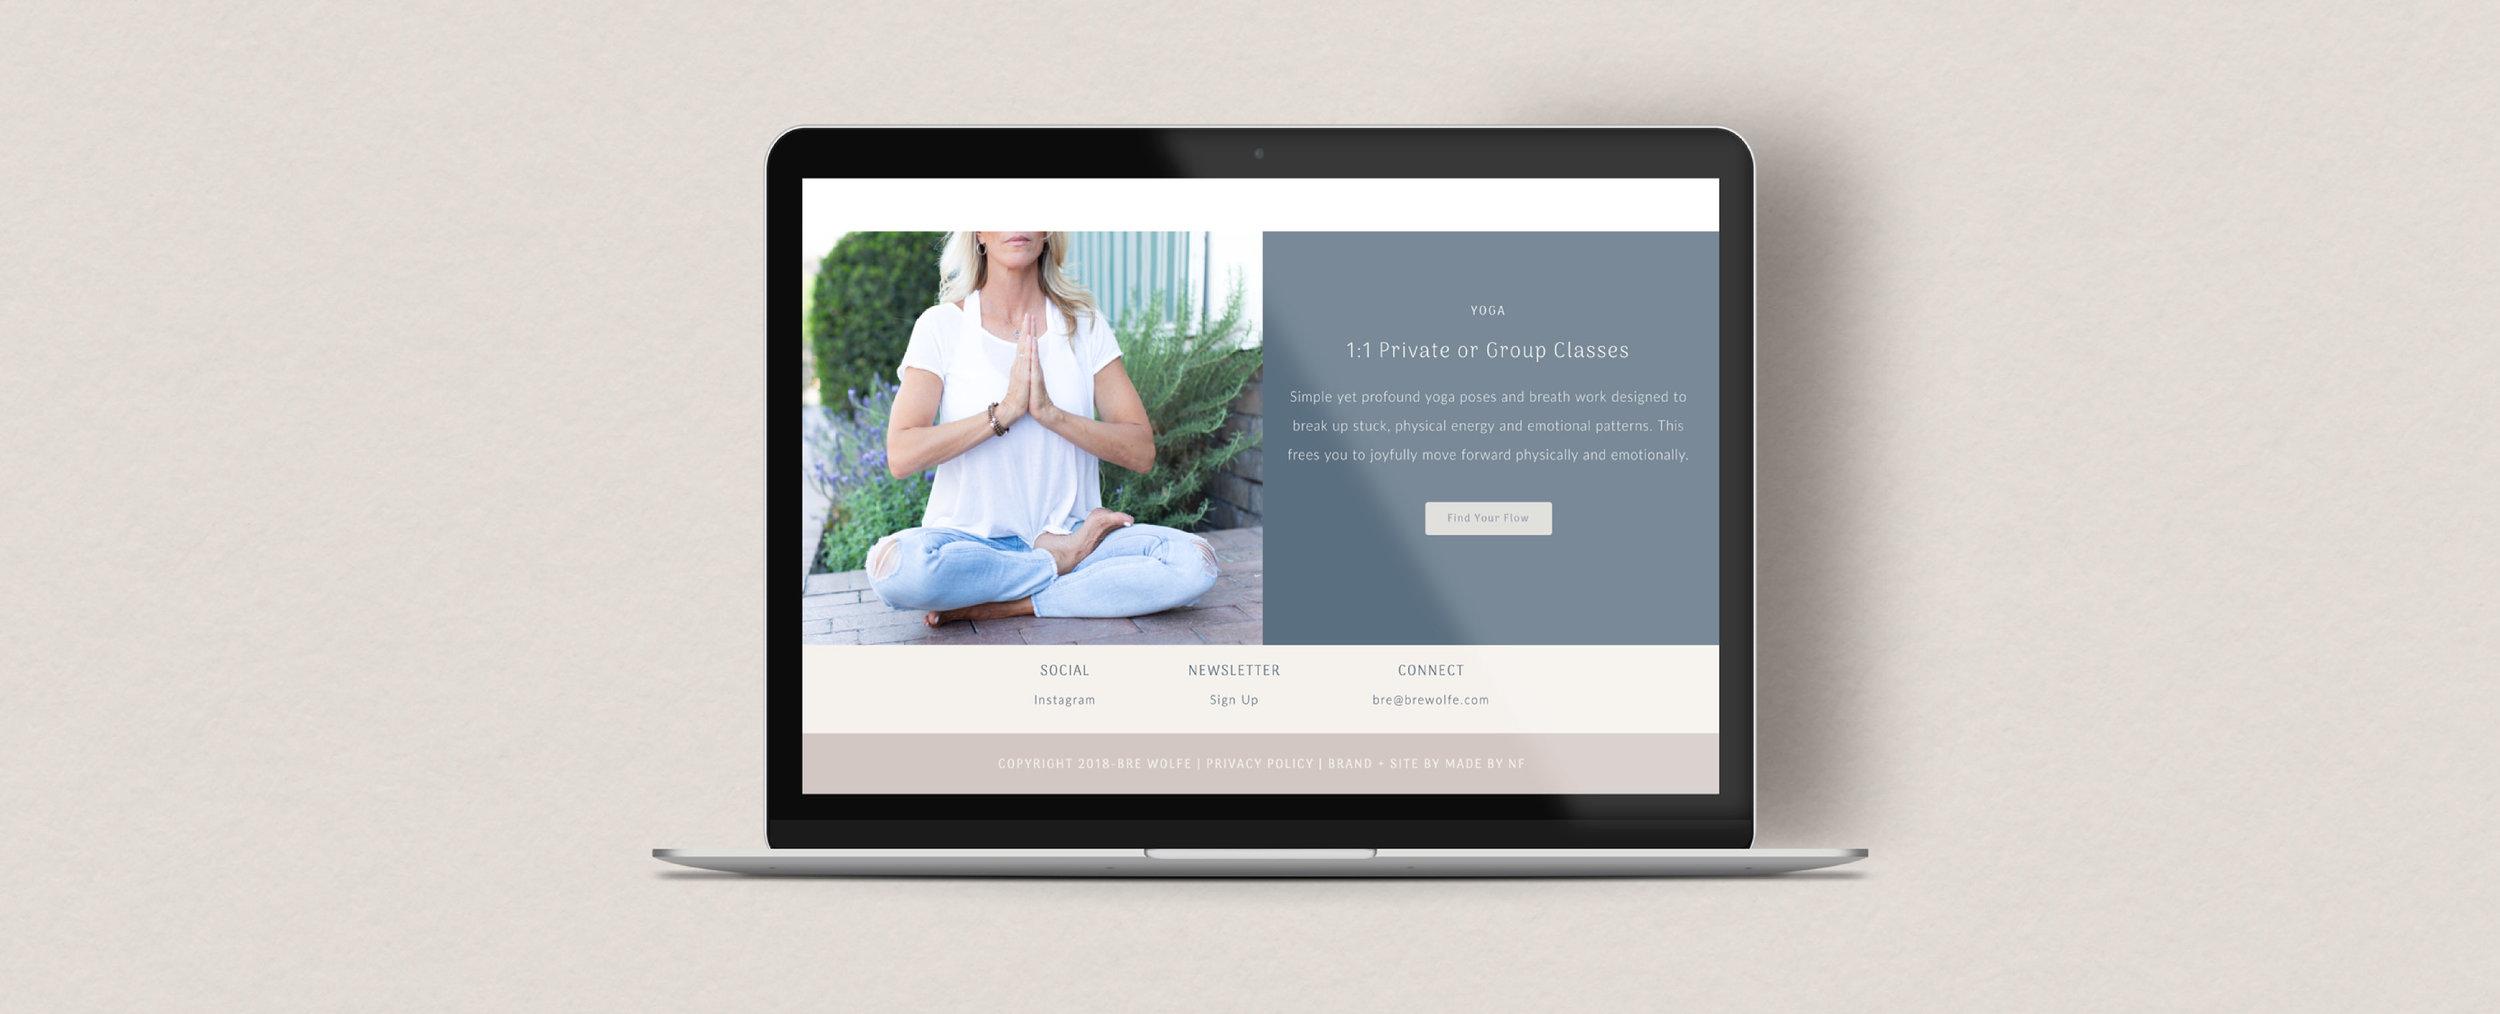 Custom Squarespace Website Design for Holistic Coaches and Holistic Yoga Instructors.jpg